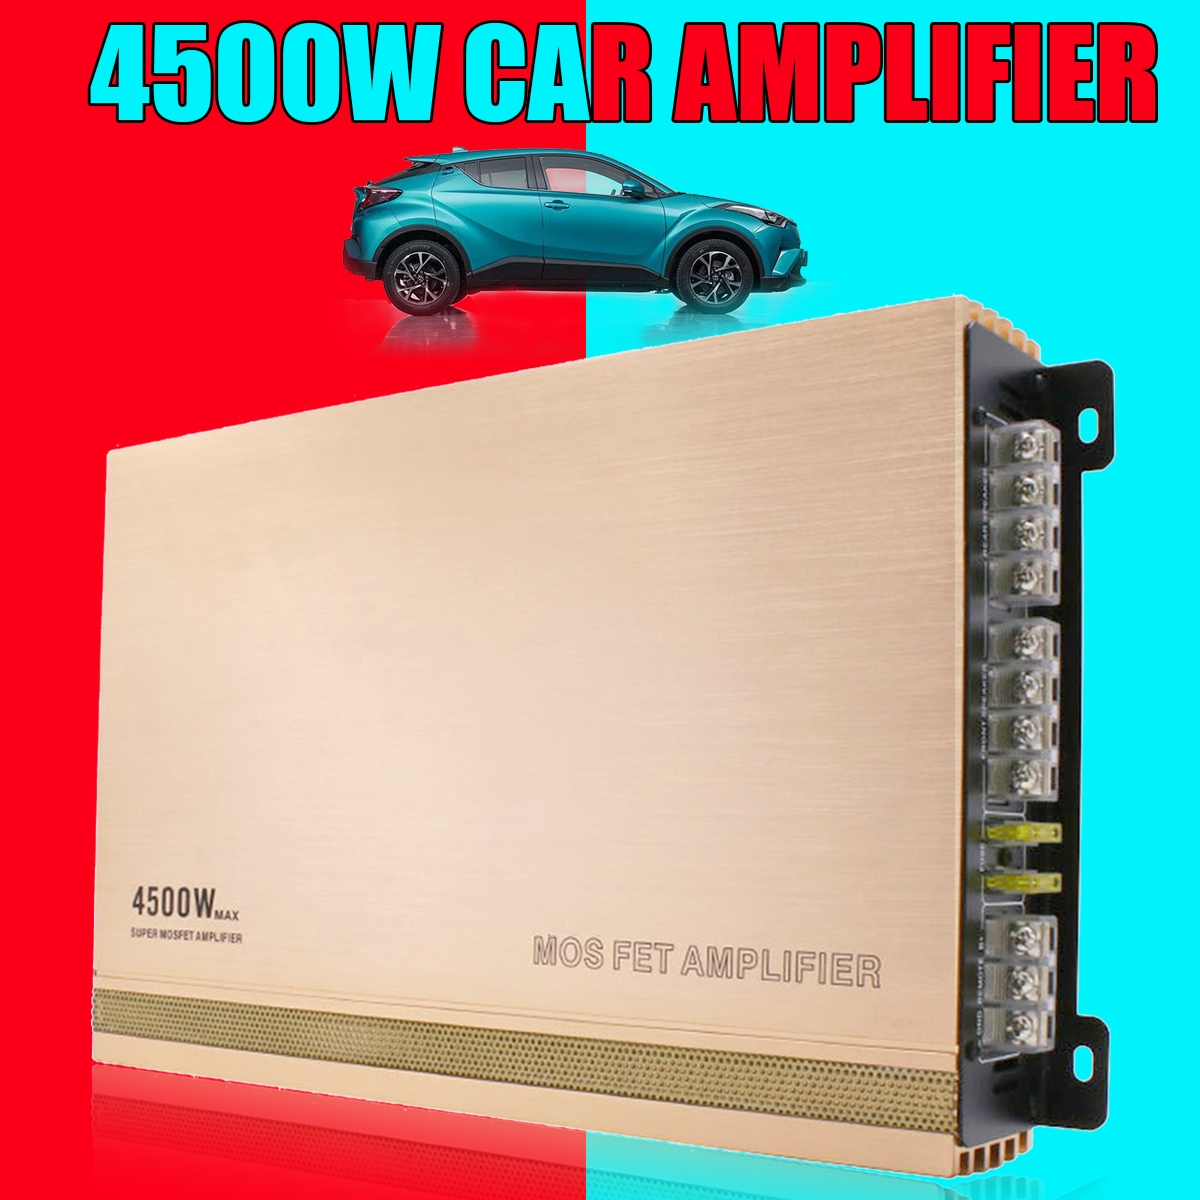 4500w High Power Aluminum Alloy Car Amplifier Speaker Portable Auto Stereo Player Audio Auto Sound Amplifier Subwoofer For Auto auto audio